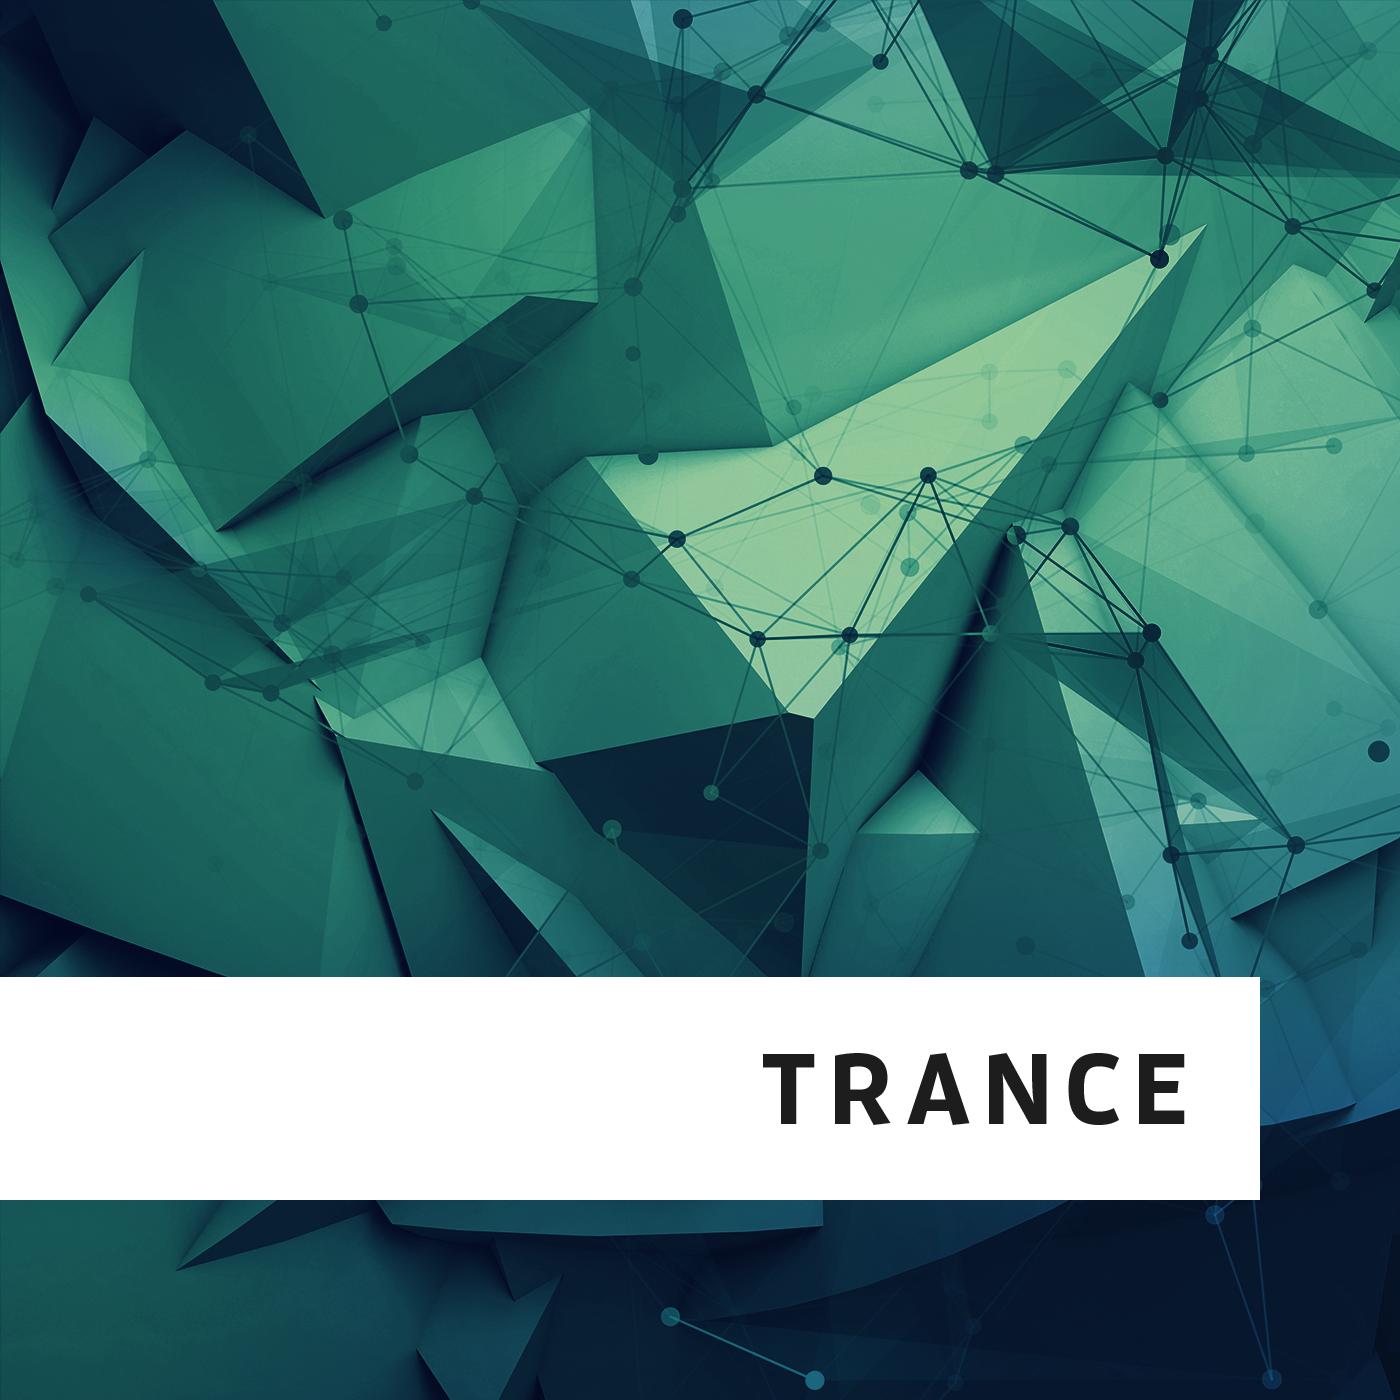 Vocal Trance ДИФМ  Радио онлайн